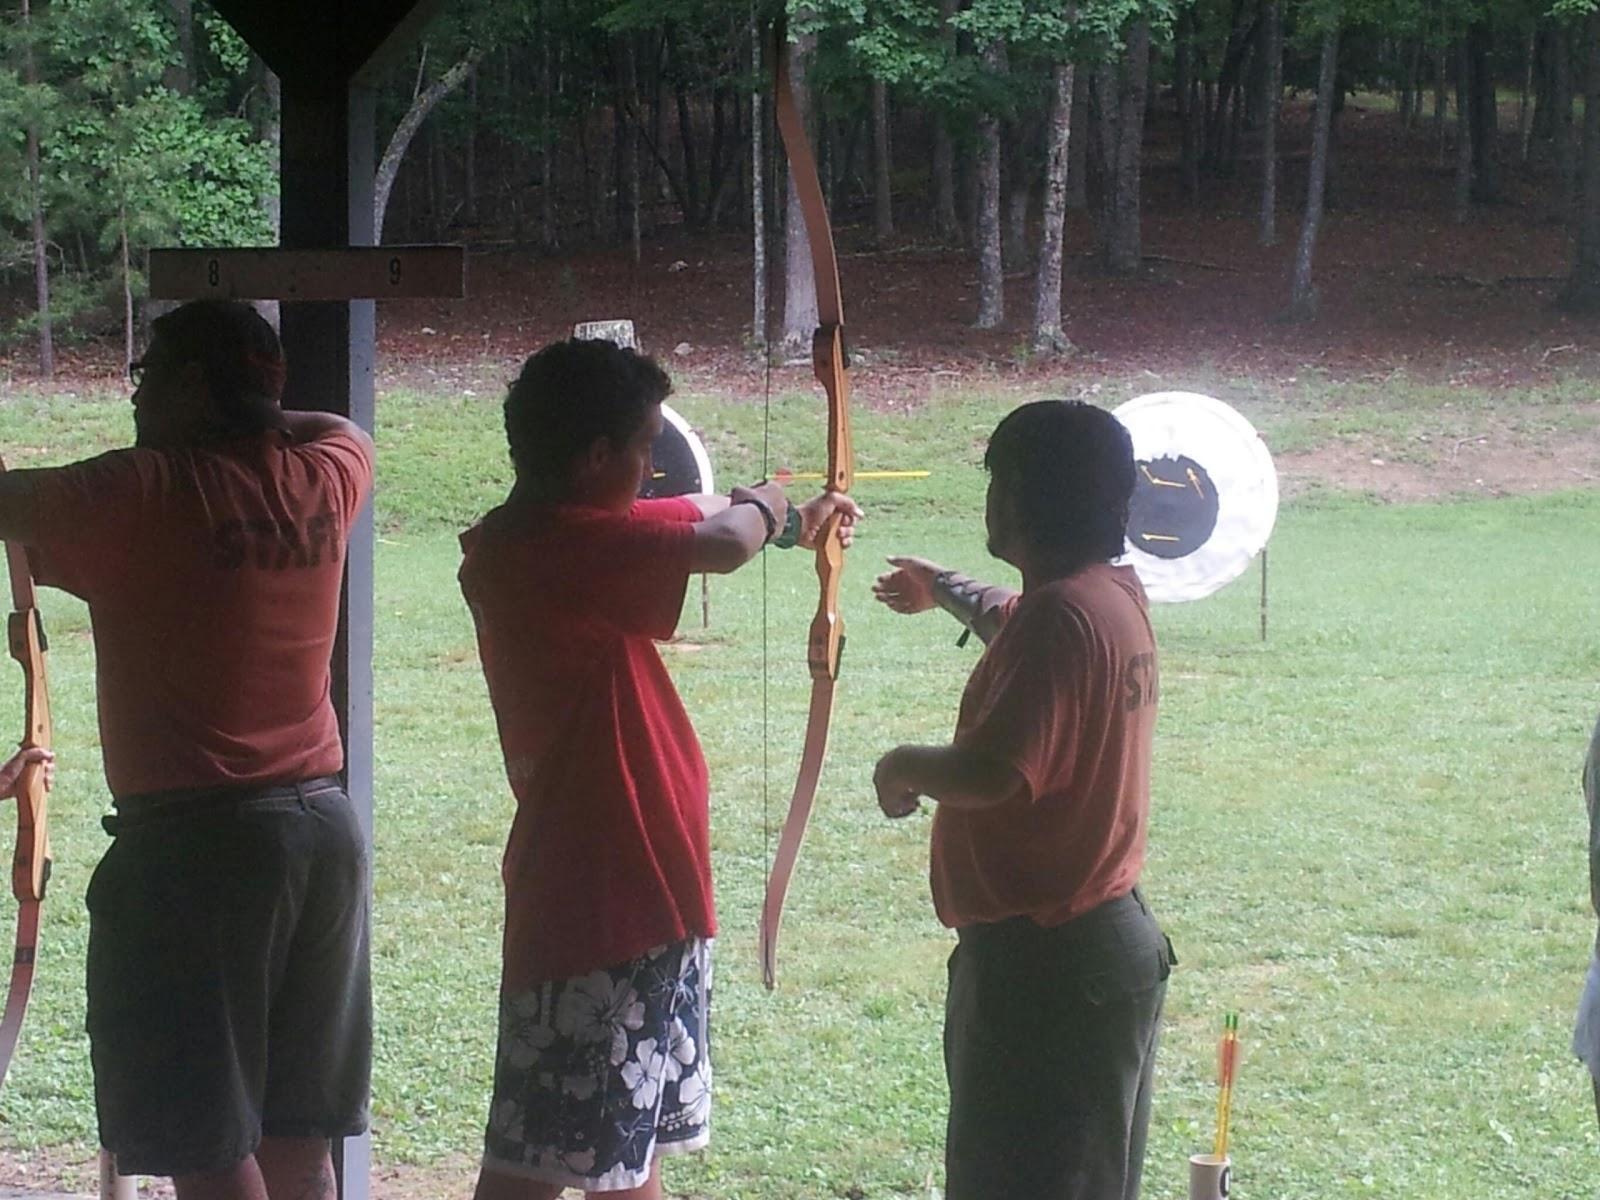 Troop 200 Summer Camp Archery Range